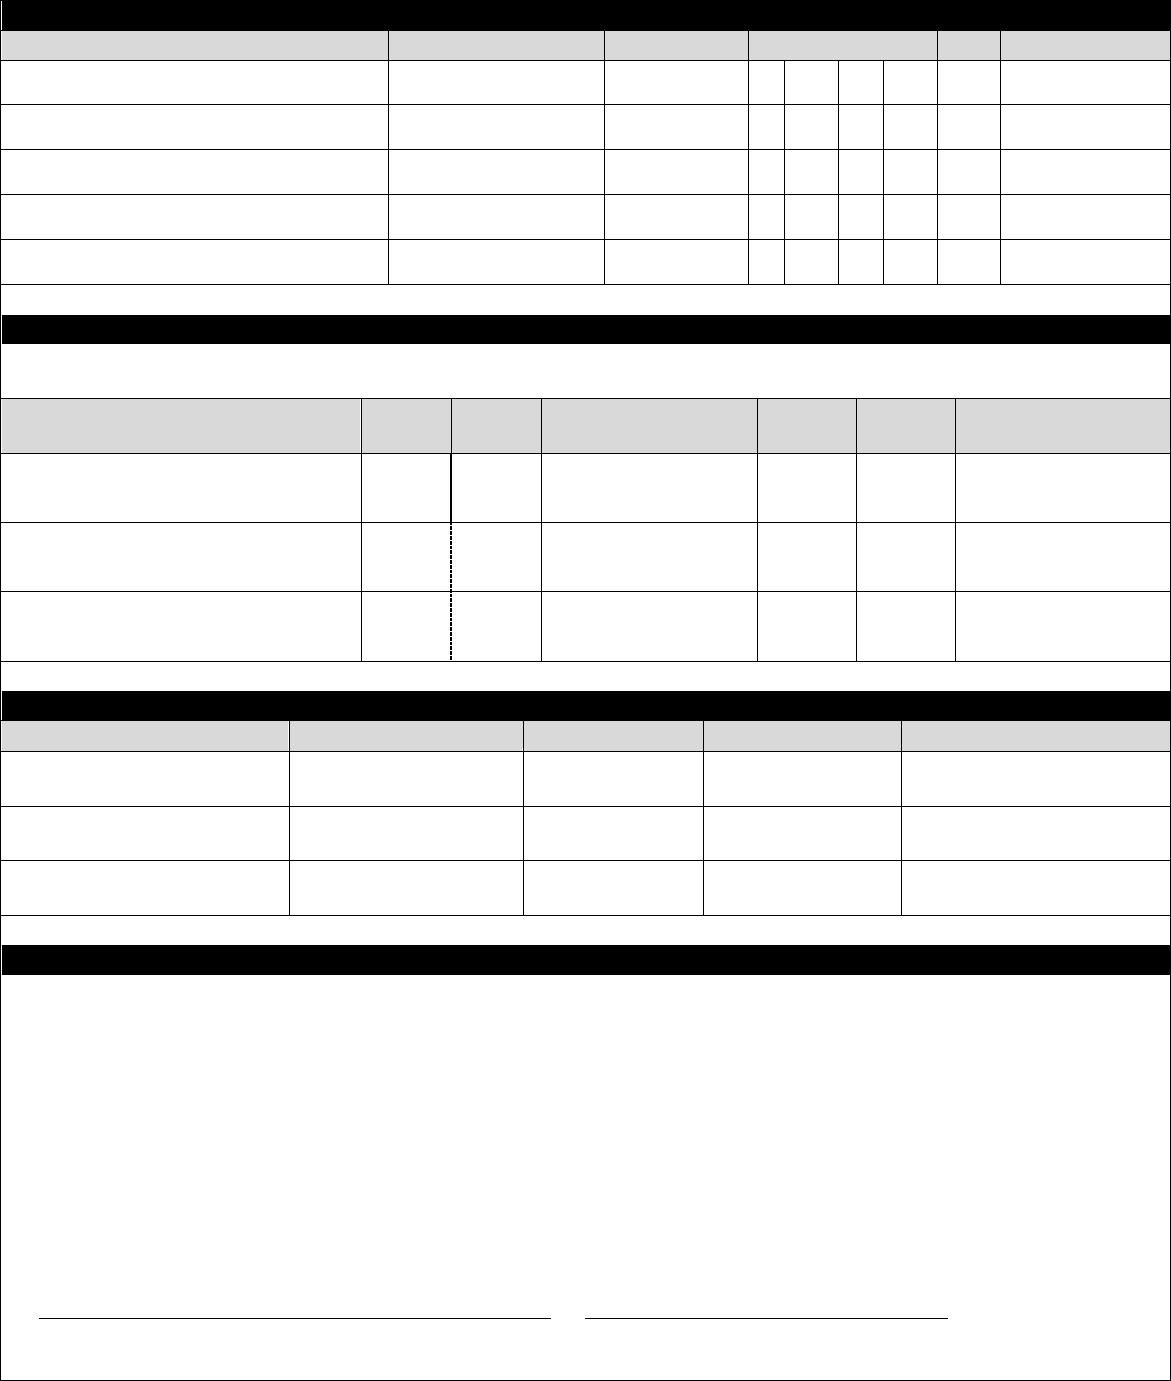 Free Printable Jamba Juice Job Application Form Page 2